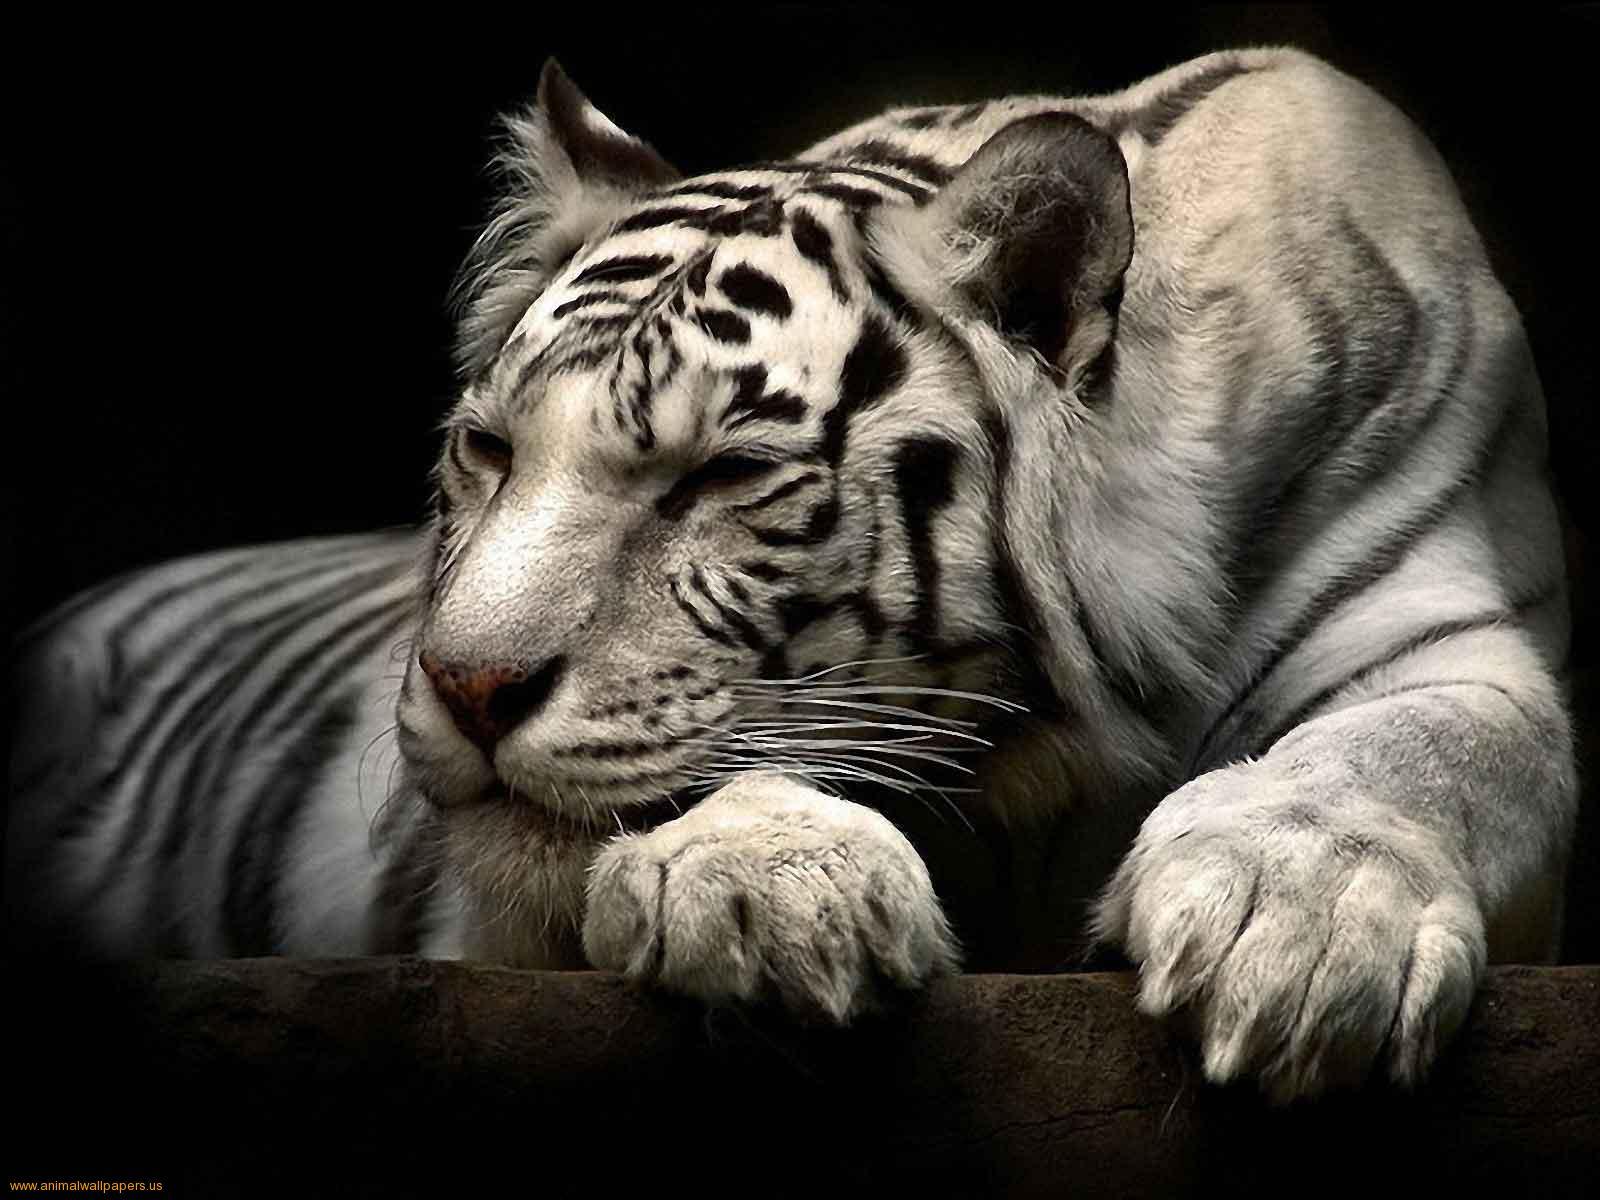 TIGER WALLPAPERS: Siberian White Tiger Wallpaper